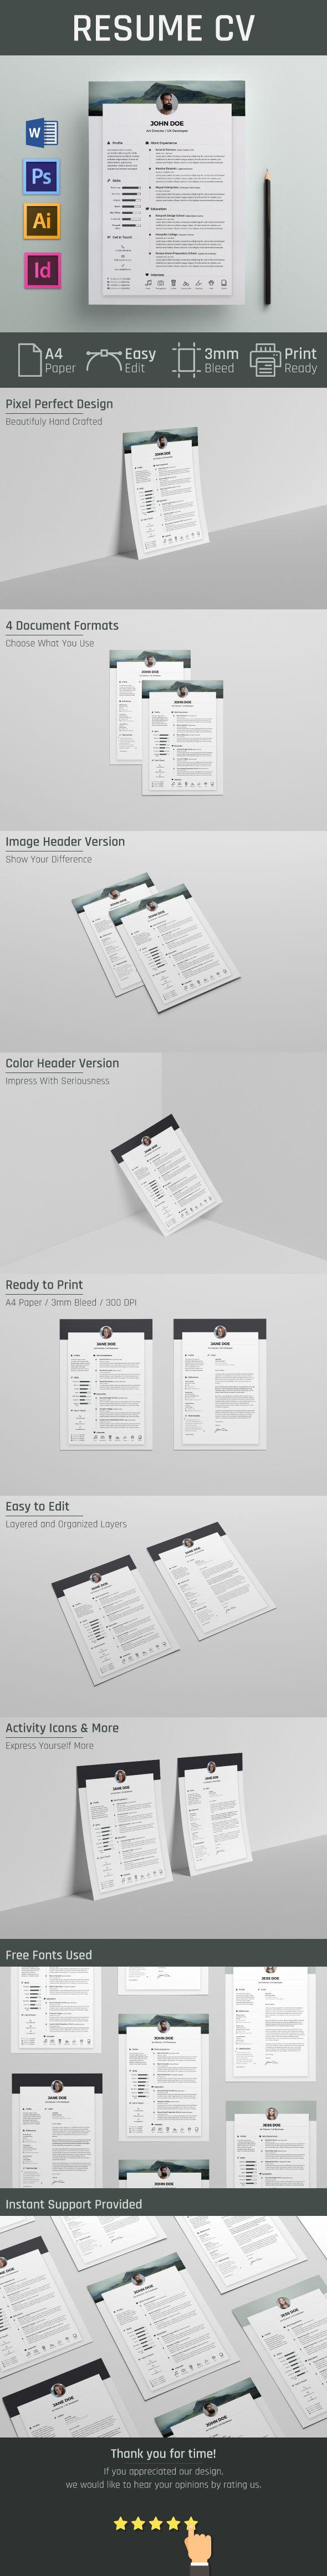 Free Resume CV Template on Behance